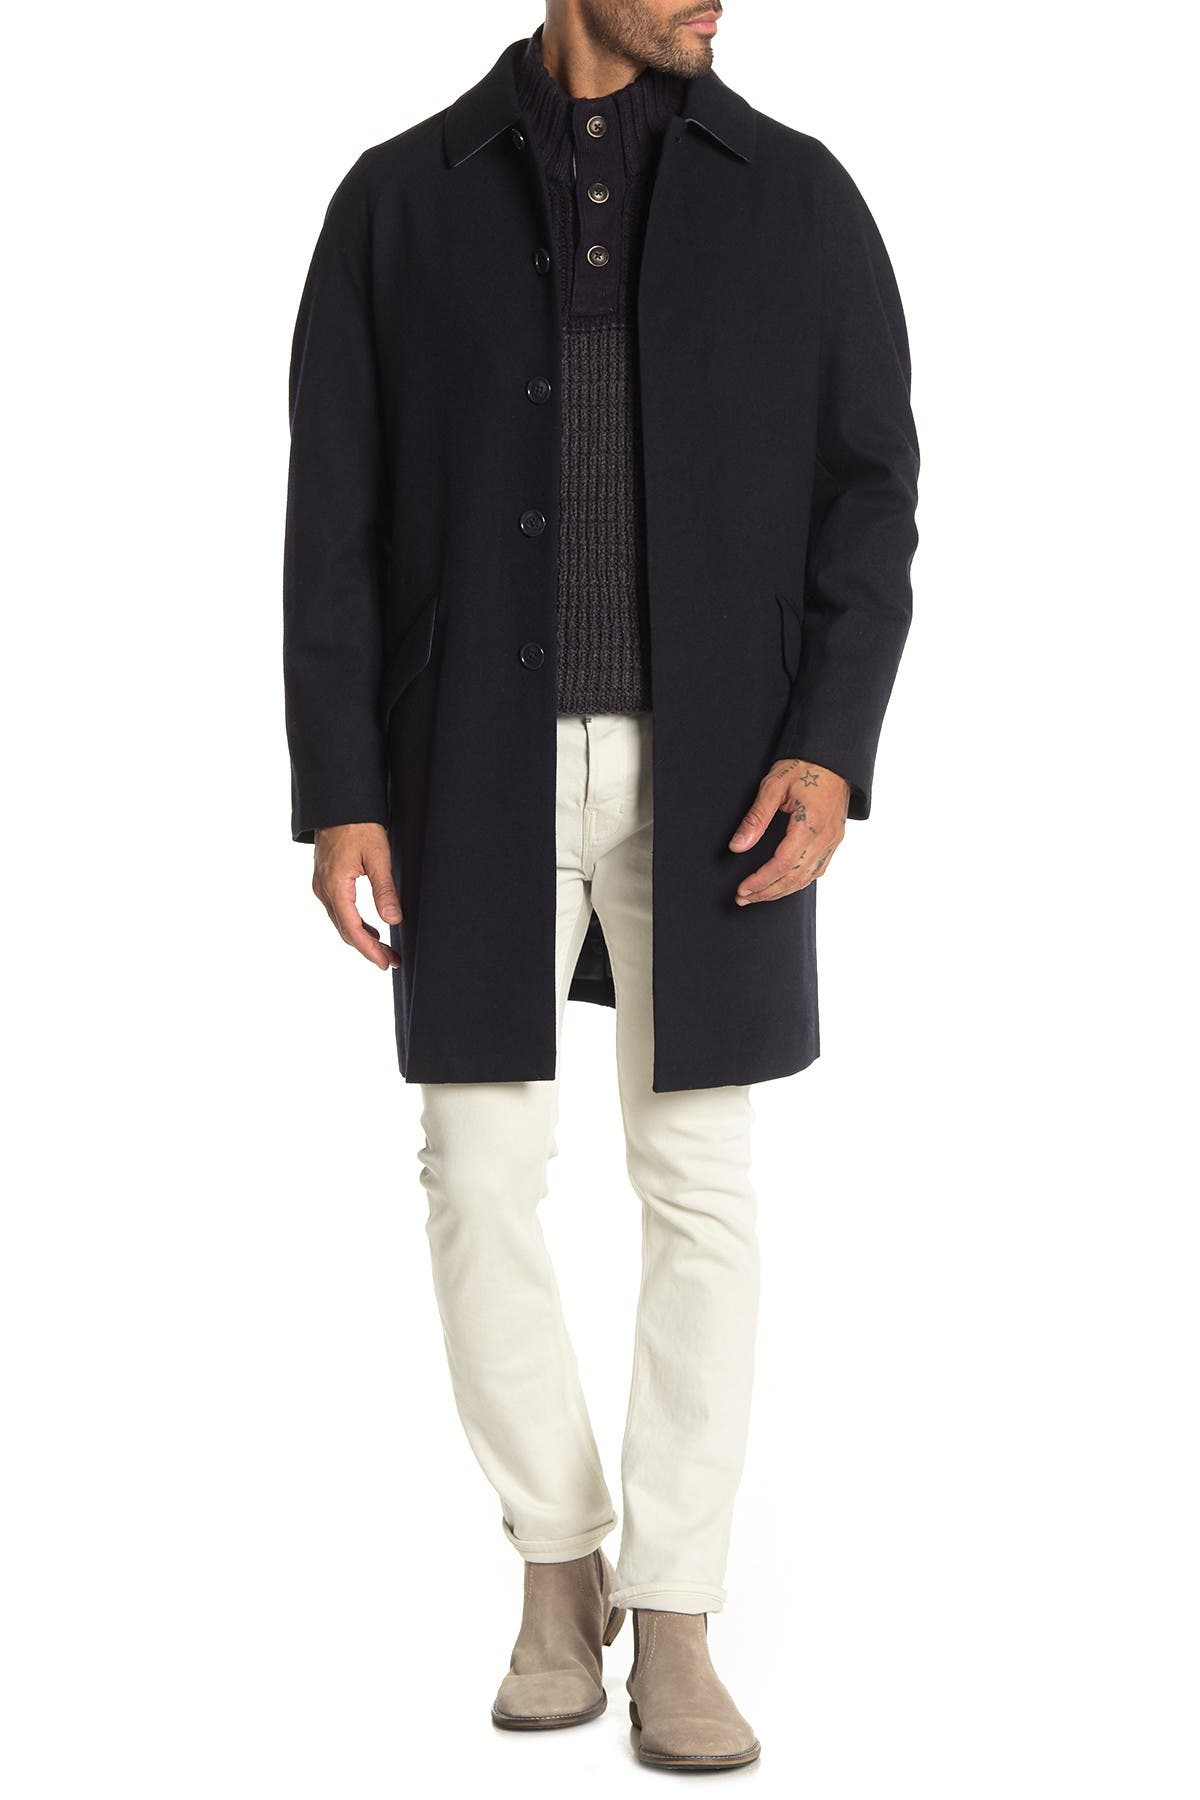 DKNY Basketweave Spread Collar Coat